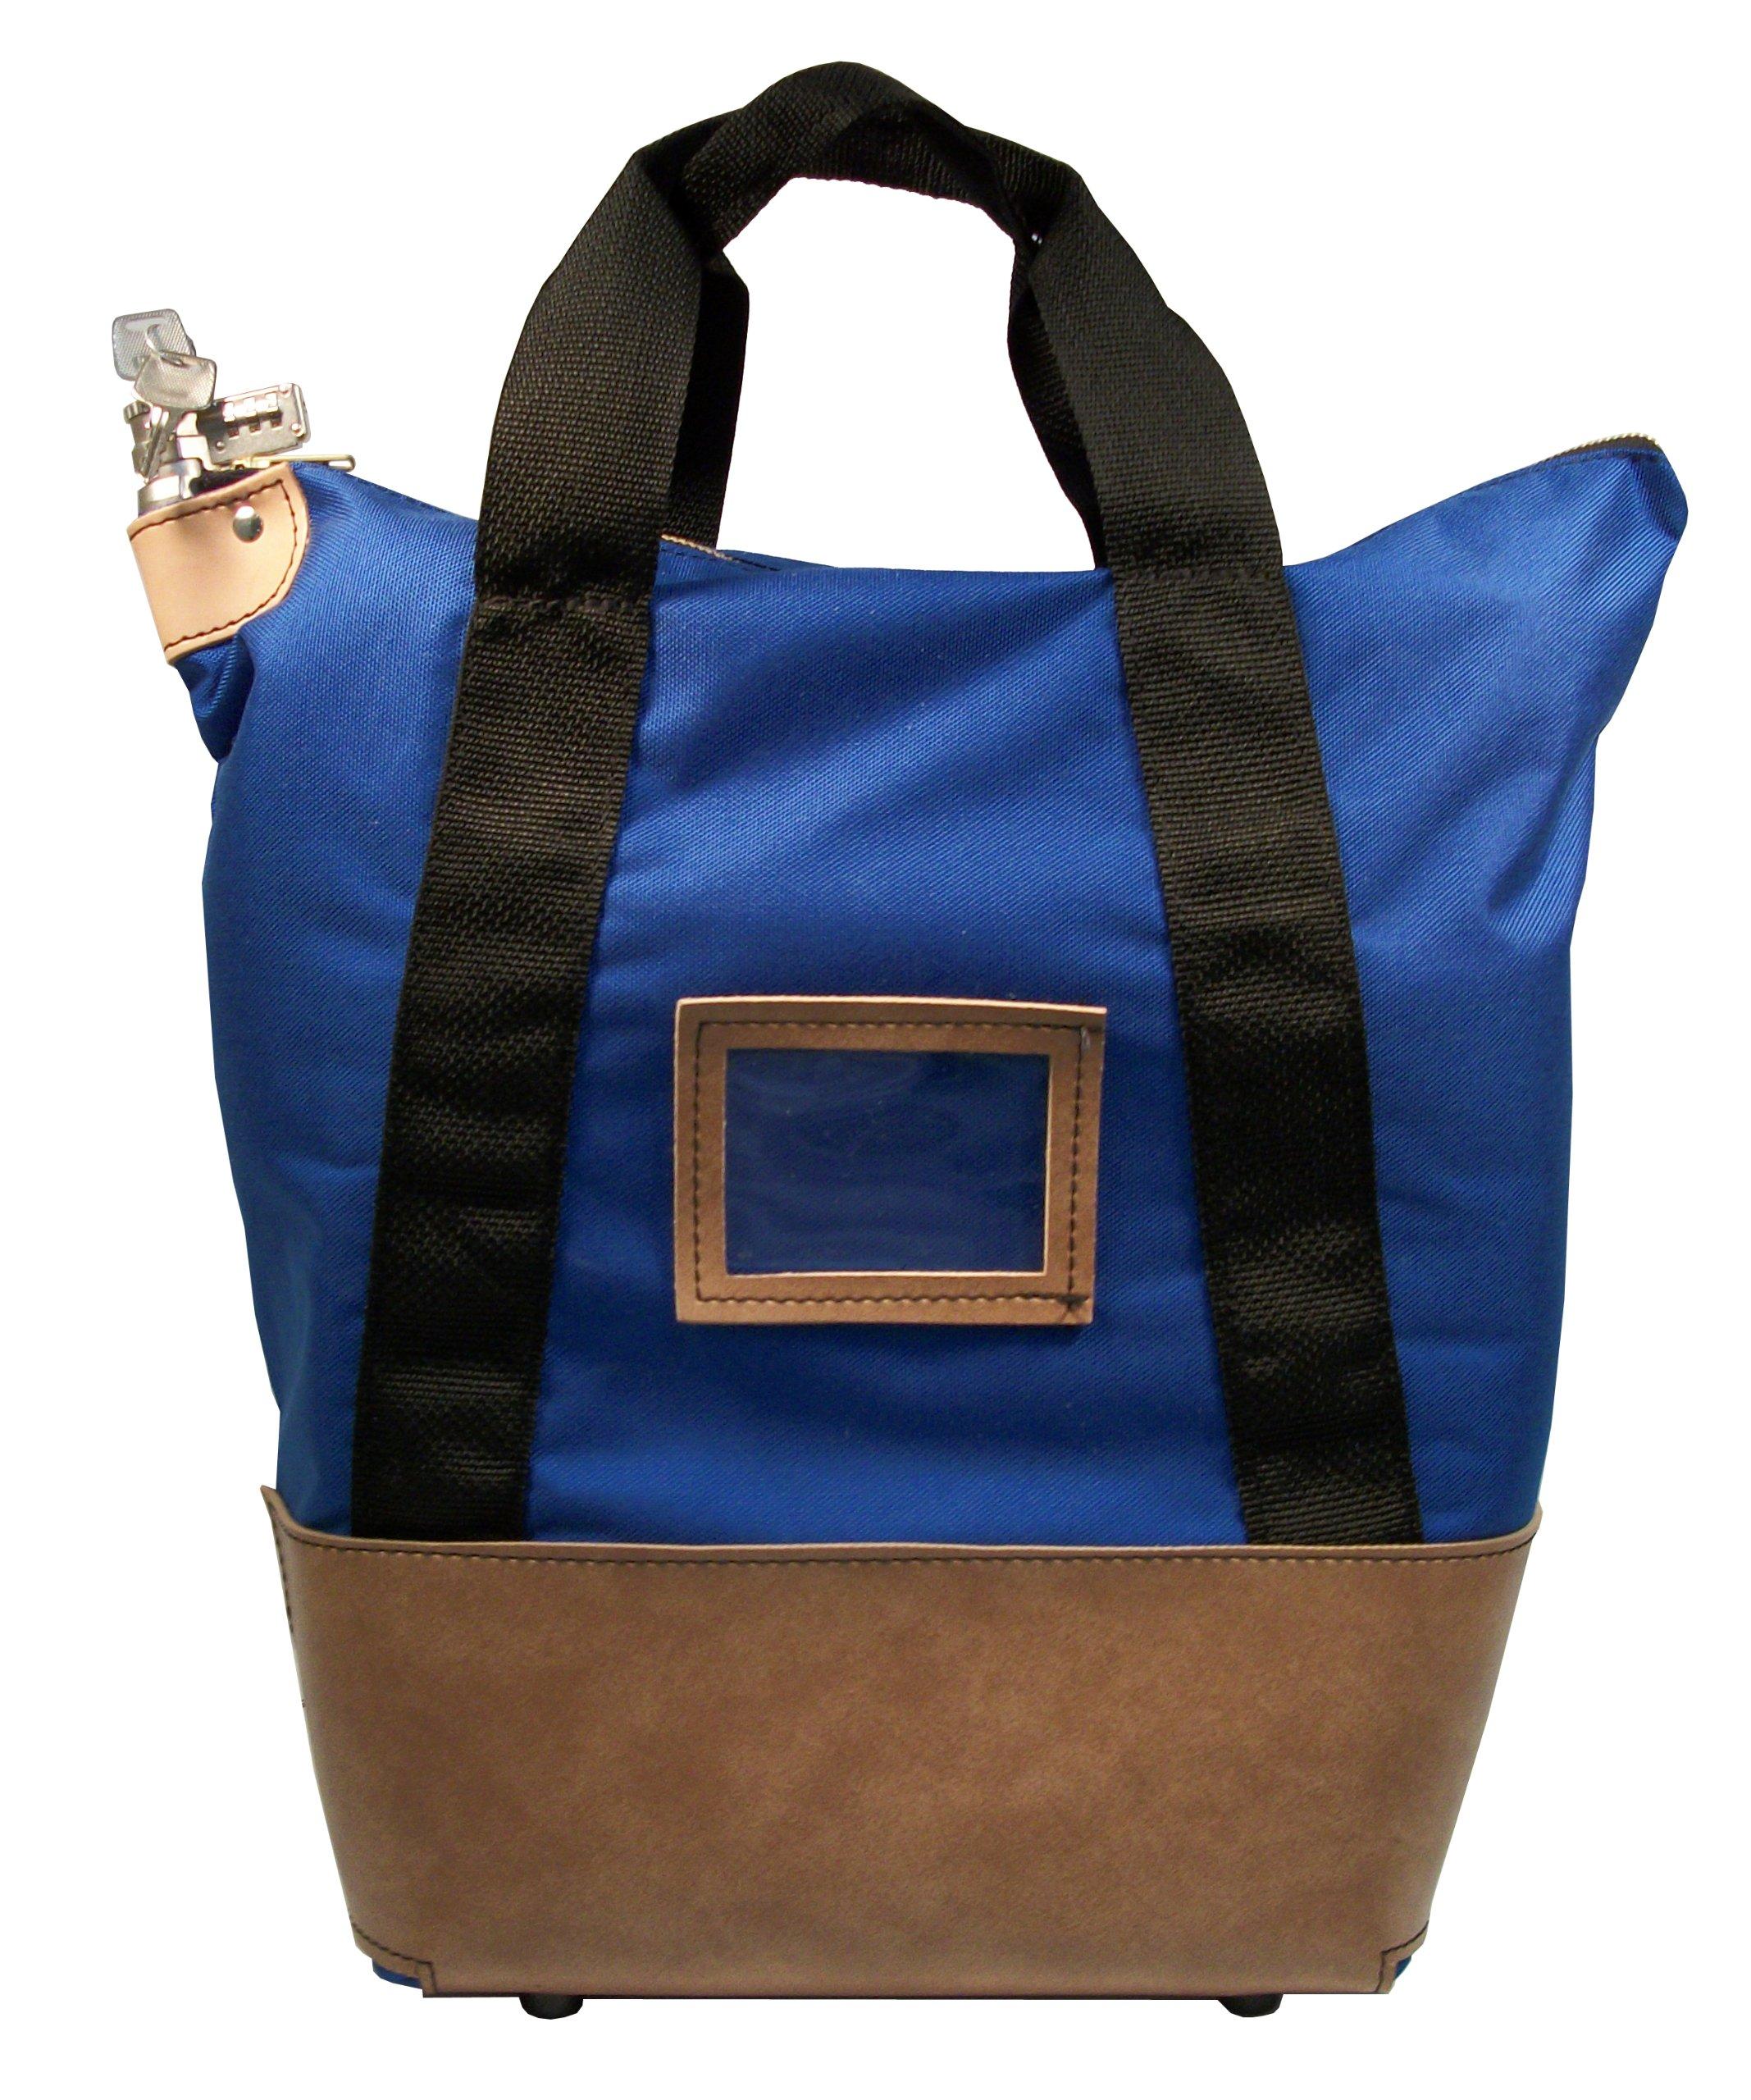 Locking Courier Bag 1000 Denier Nylon Combination Lock Royal Blue